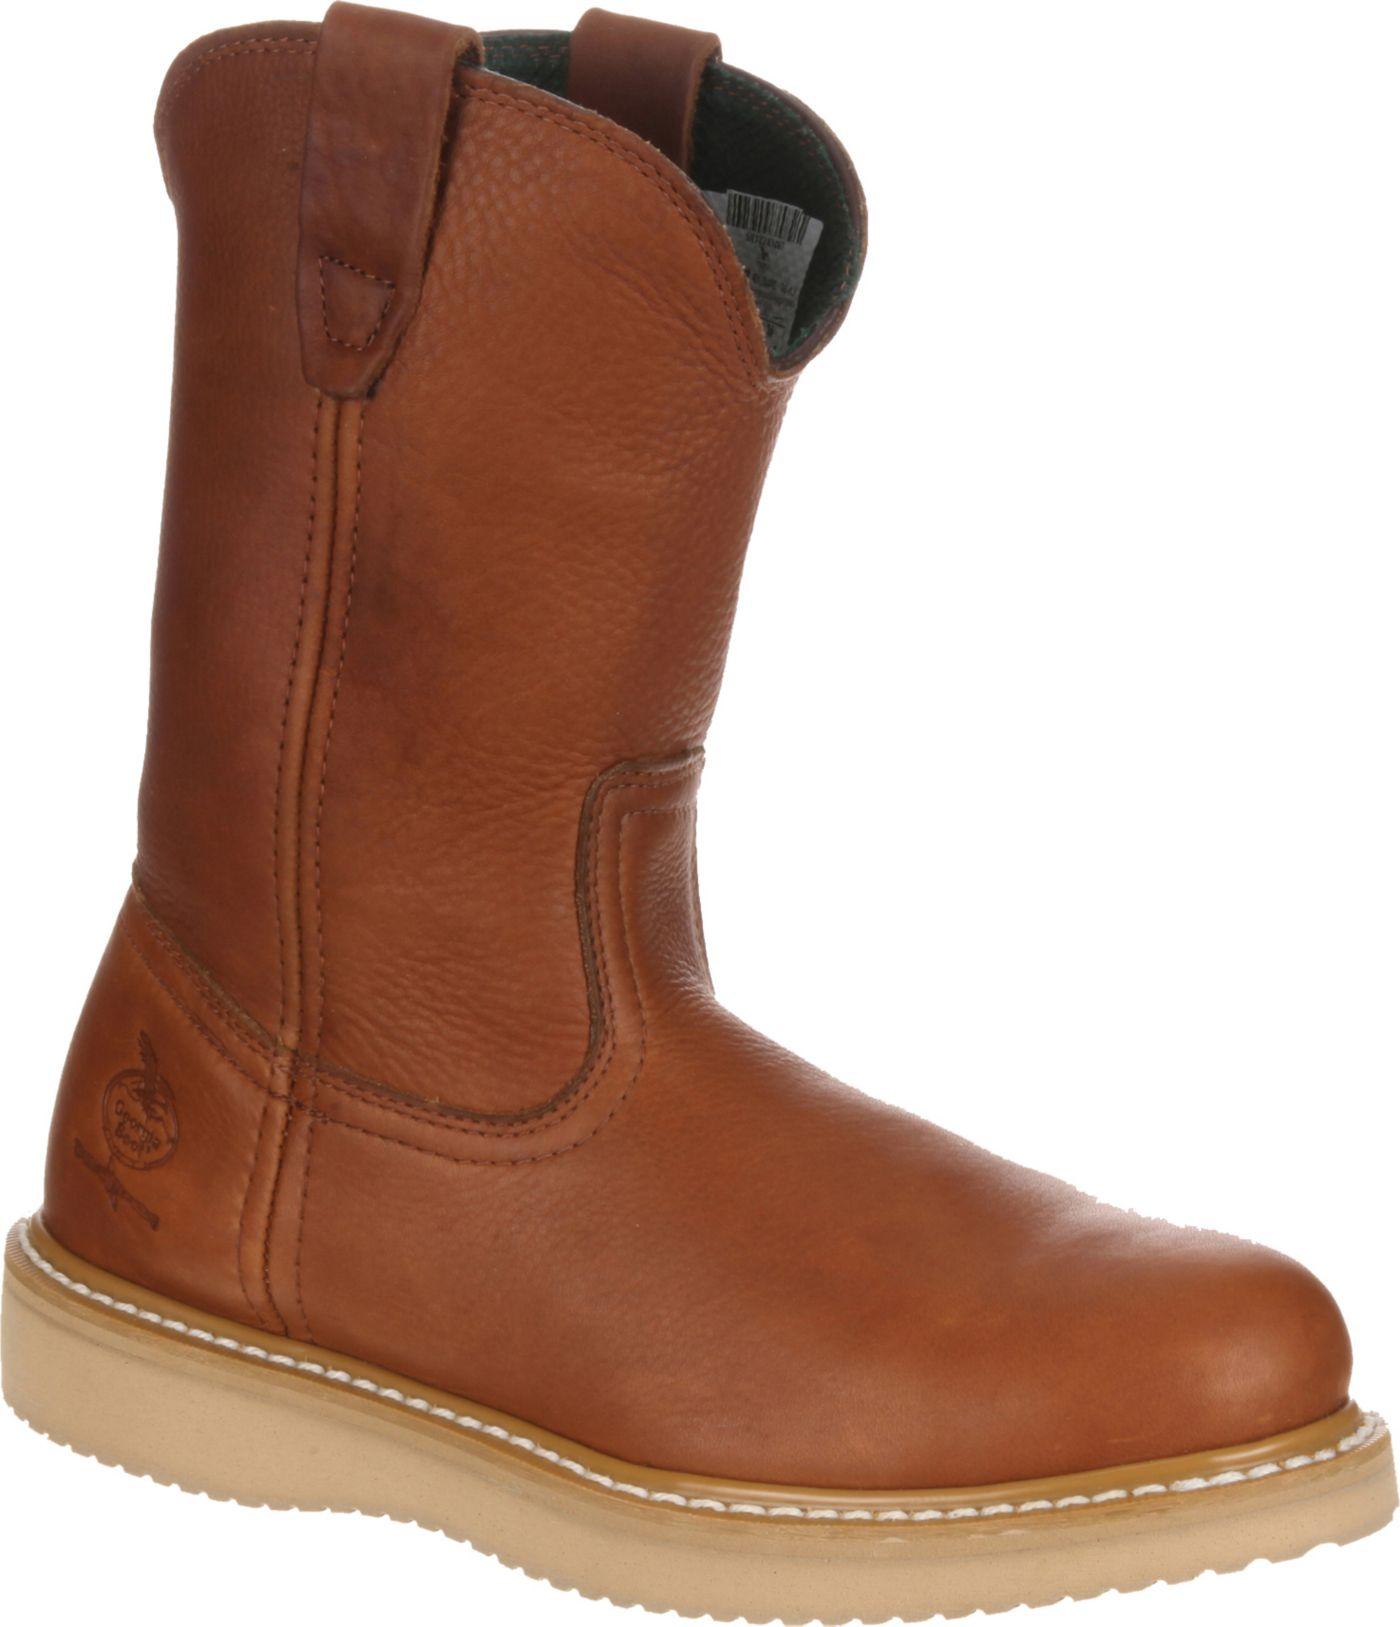 Georgia Boot Men's Farm & Ranch Wellington Work Boots